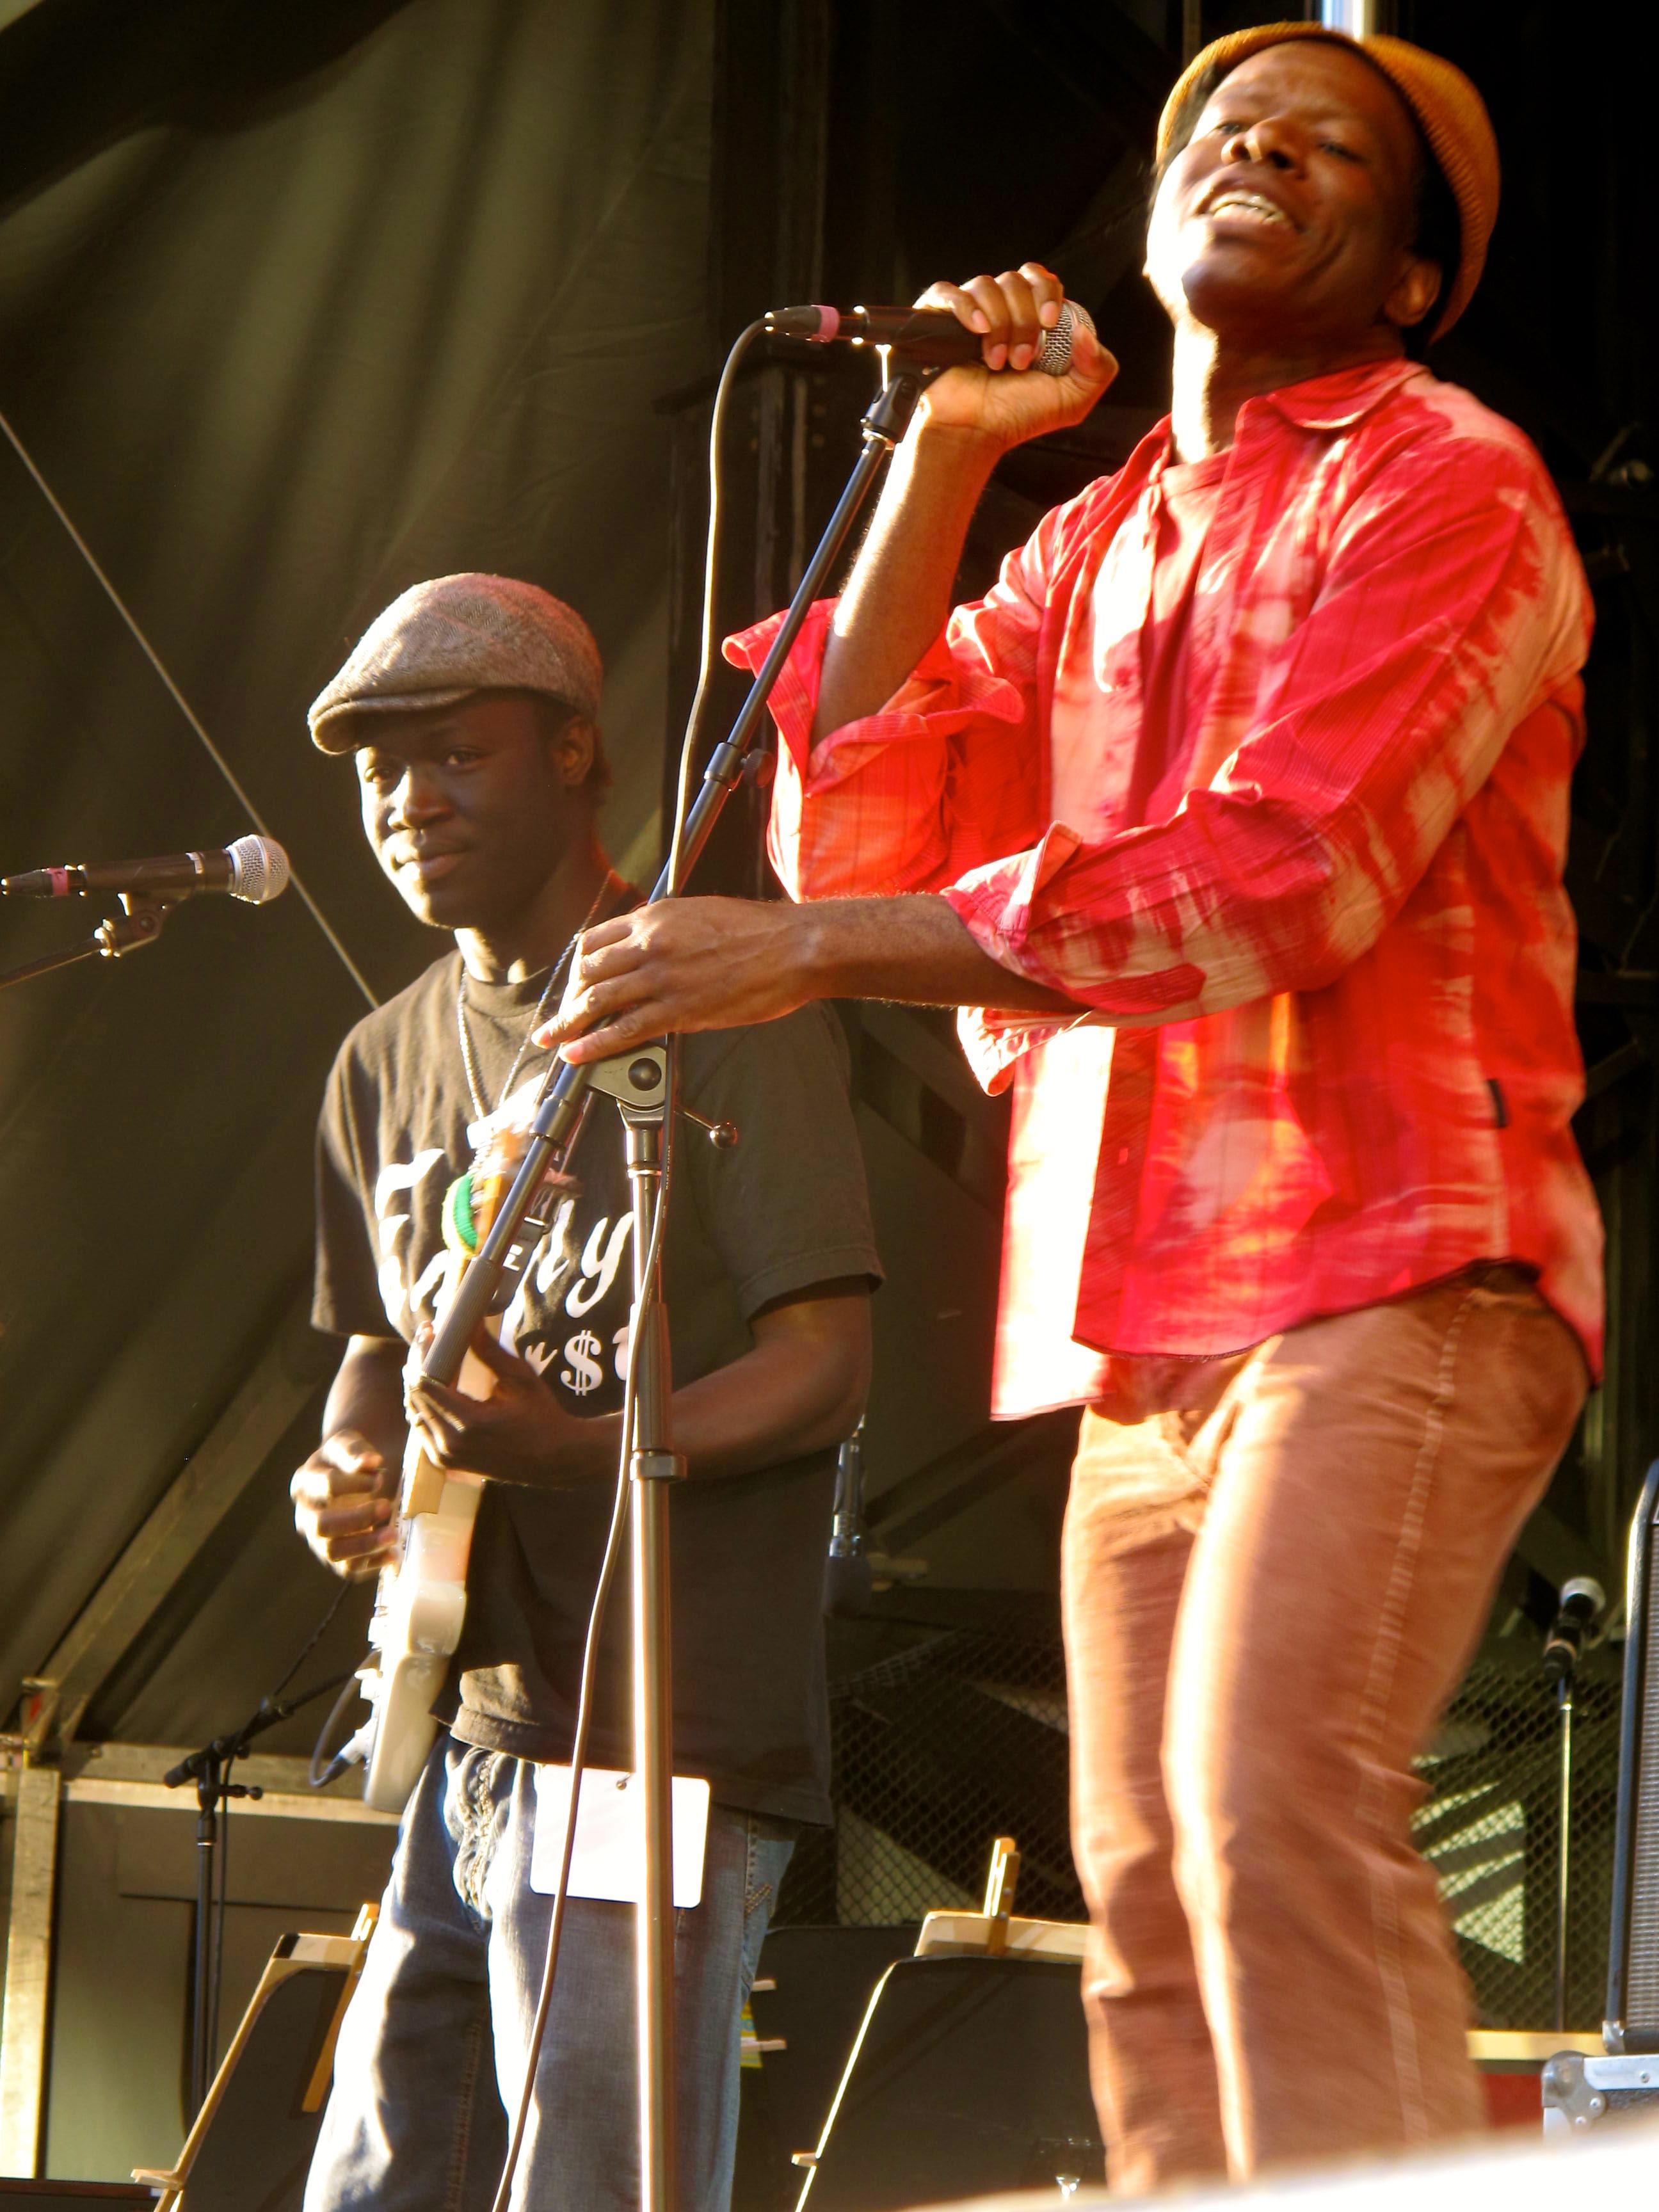 Kyssi et Assane Guitariste, FFO juin 2011, Ottawa, Canada